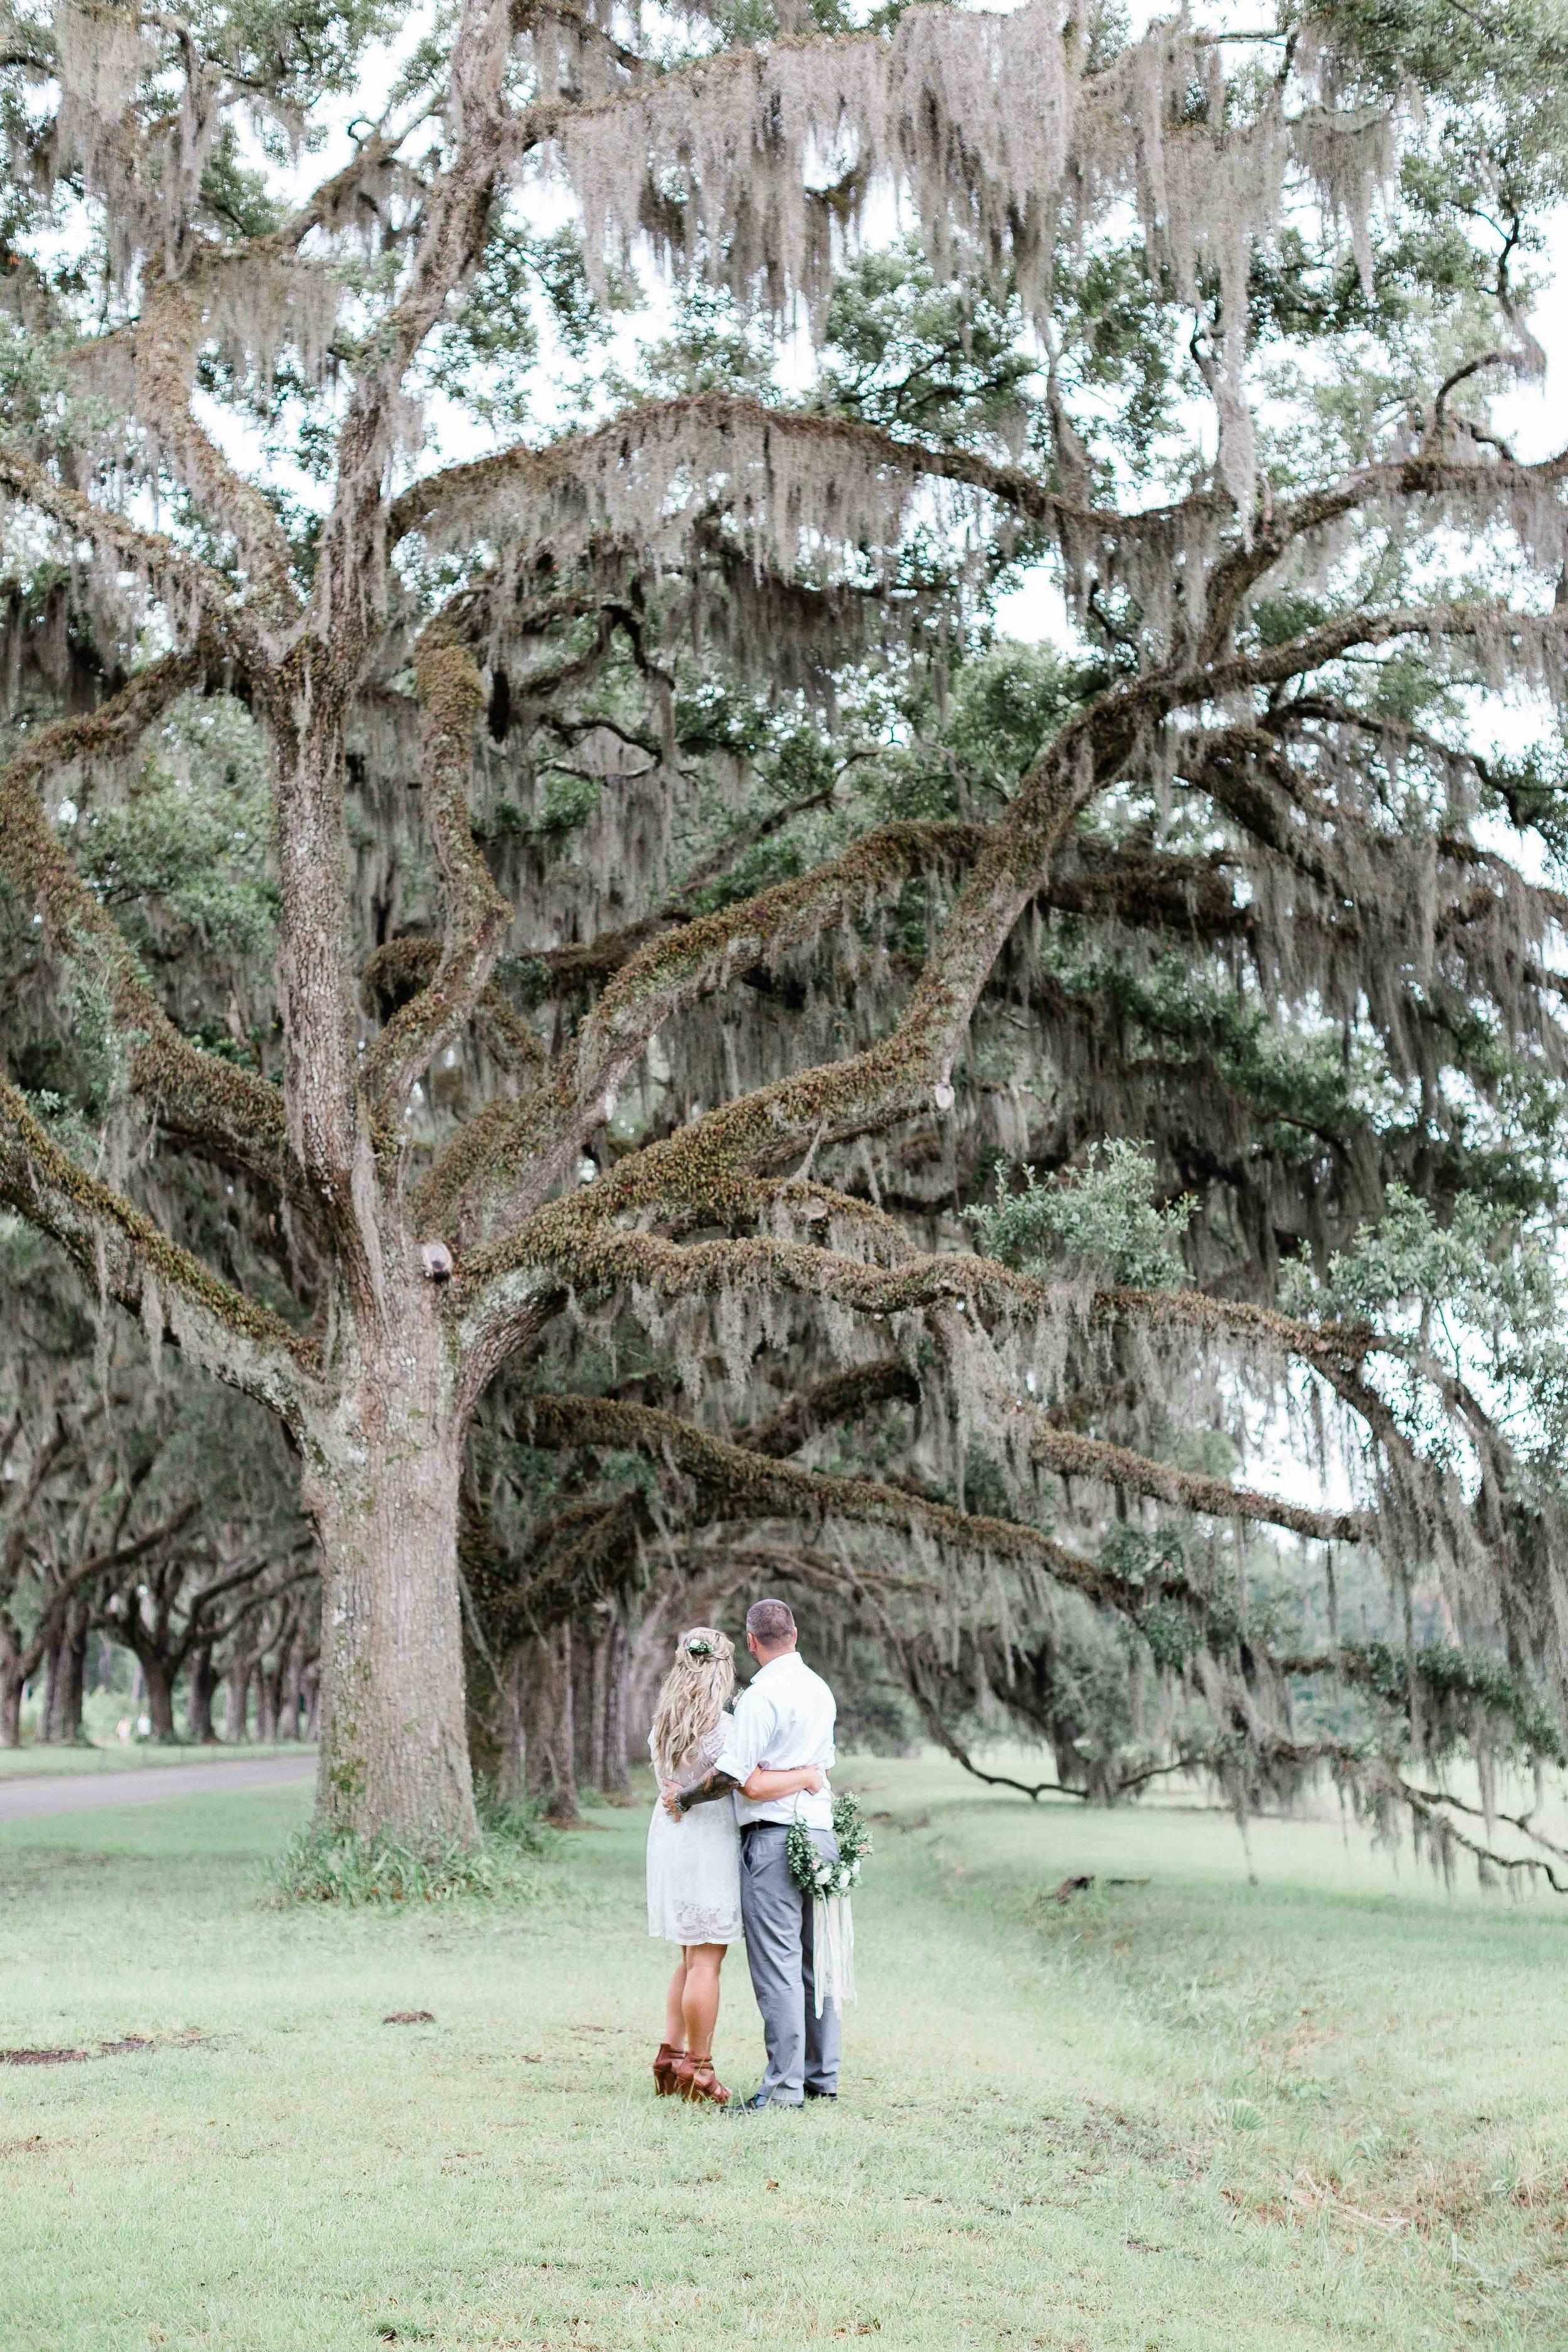 20190727Georgia-Wormlsoe Plantation-Simply Eloped-Savannah Wedding Photographer- Southern Lens Photography10.jpg